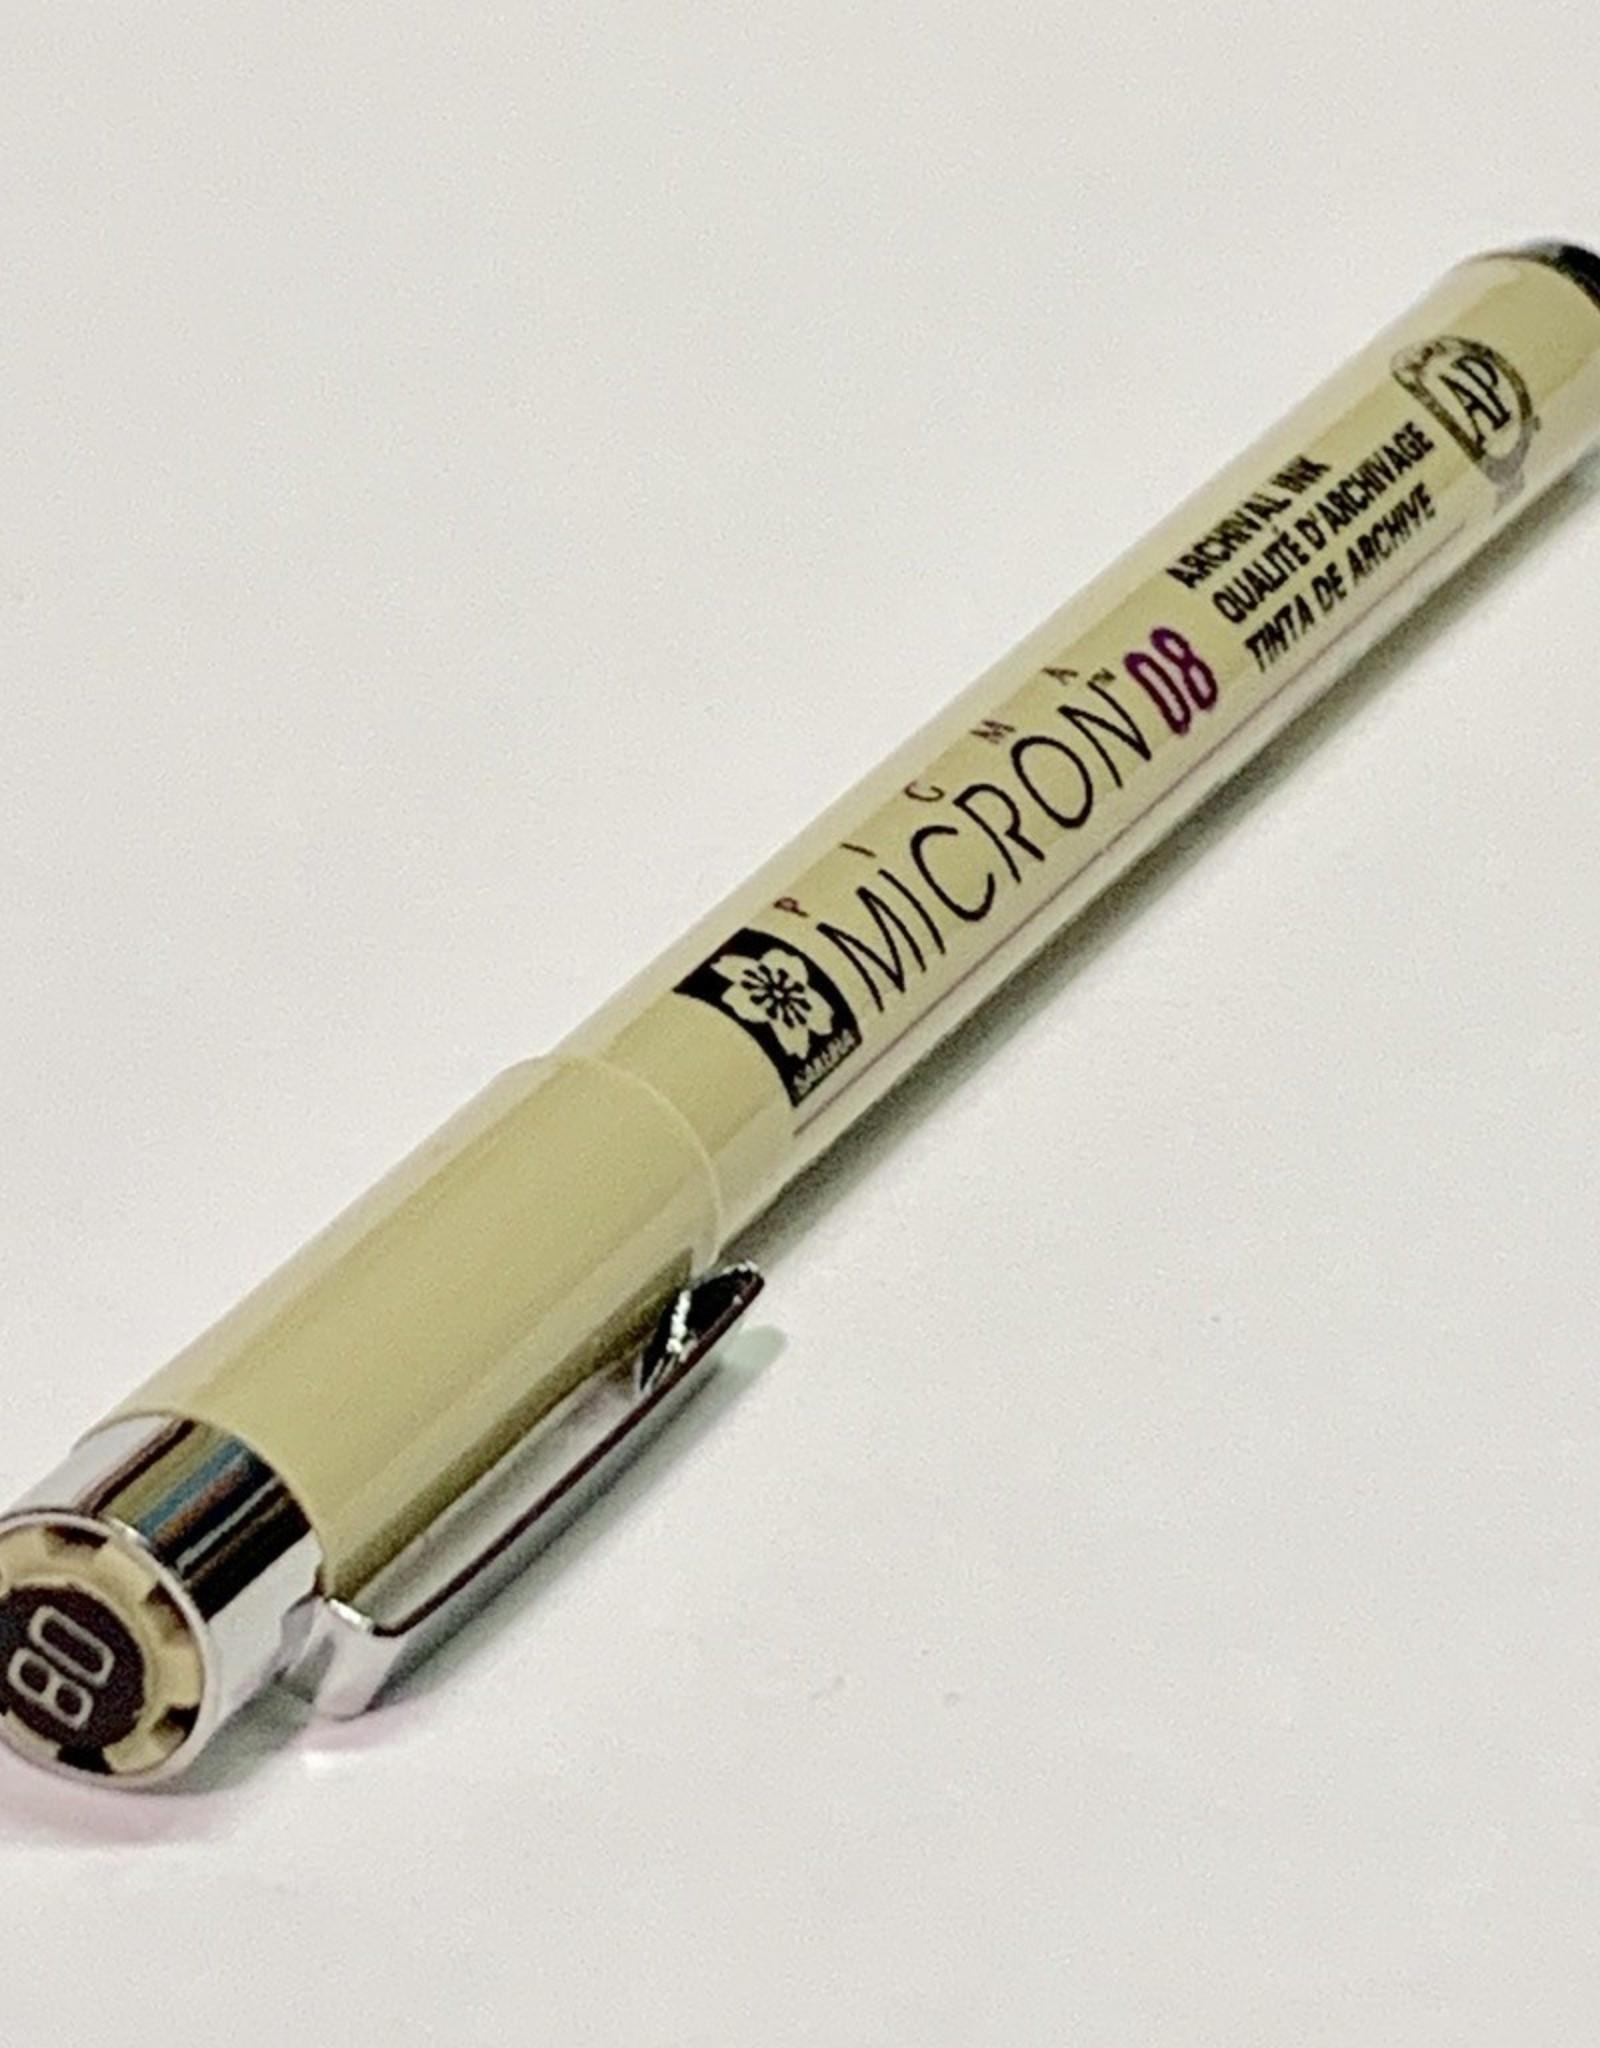 Sakura Micron Black Pen 08 .50mm